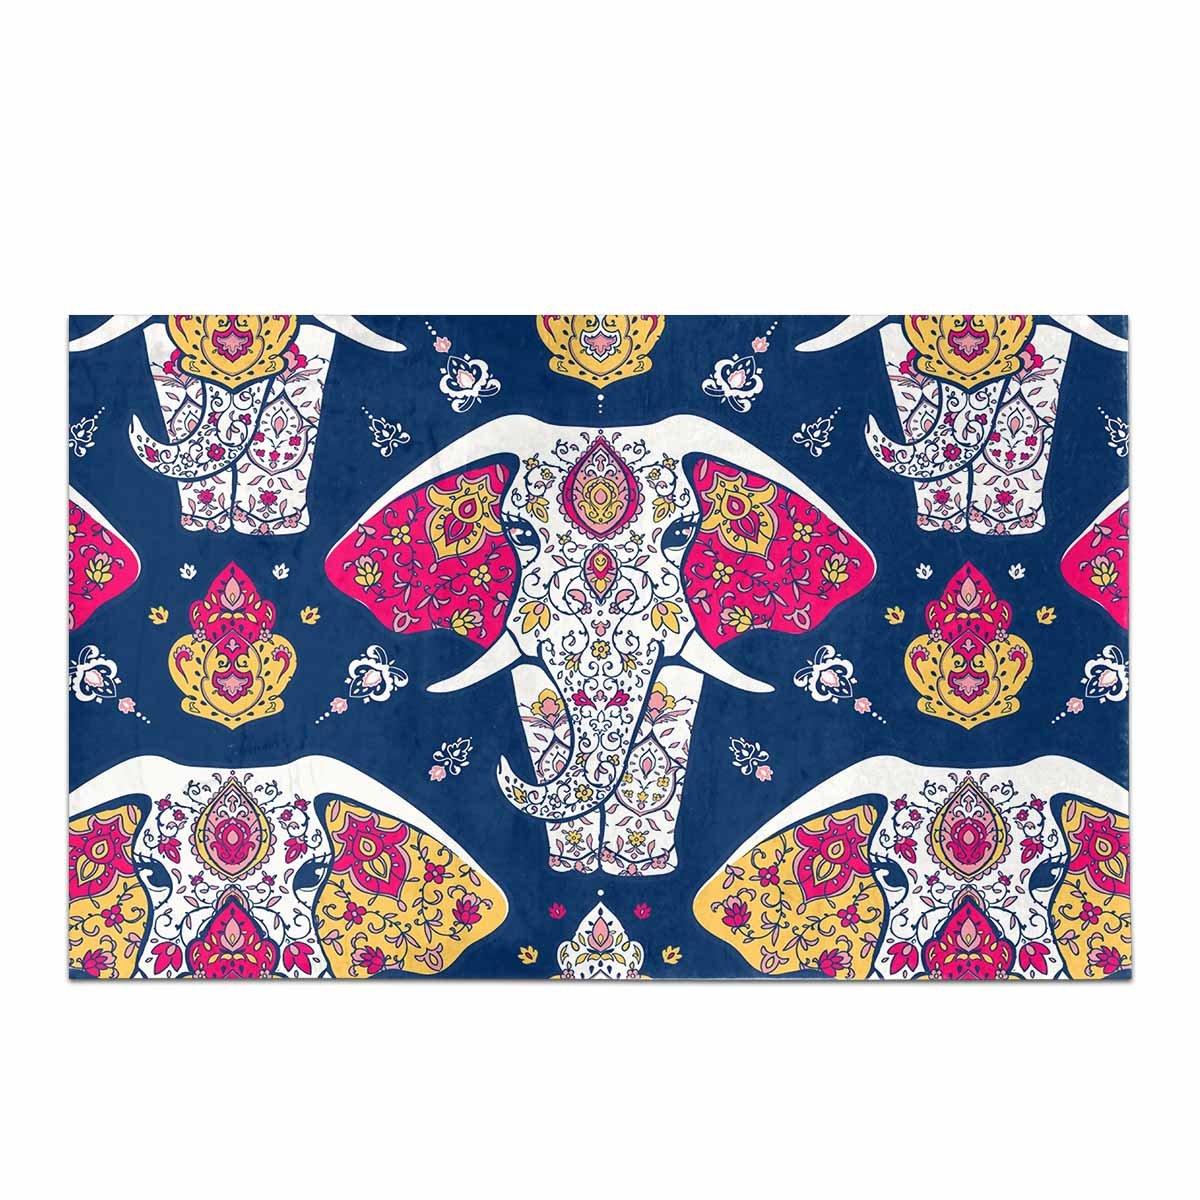 InterestPrint Hippie Mandala and Elephant Yoga India Arabic Style Home Decor Non Slip Soft Bath Rug Mats Shower Rug for Bathroom Tub Bedroom Large Size 20 x 32 Inches